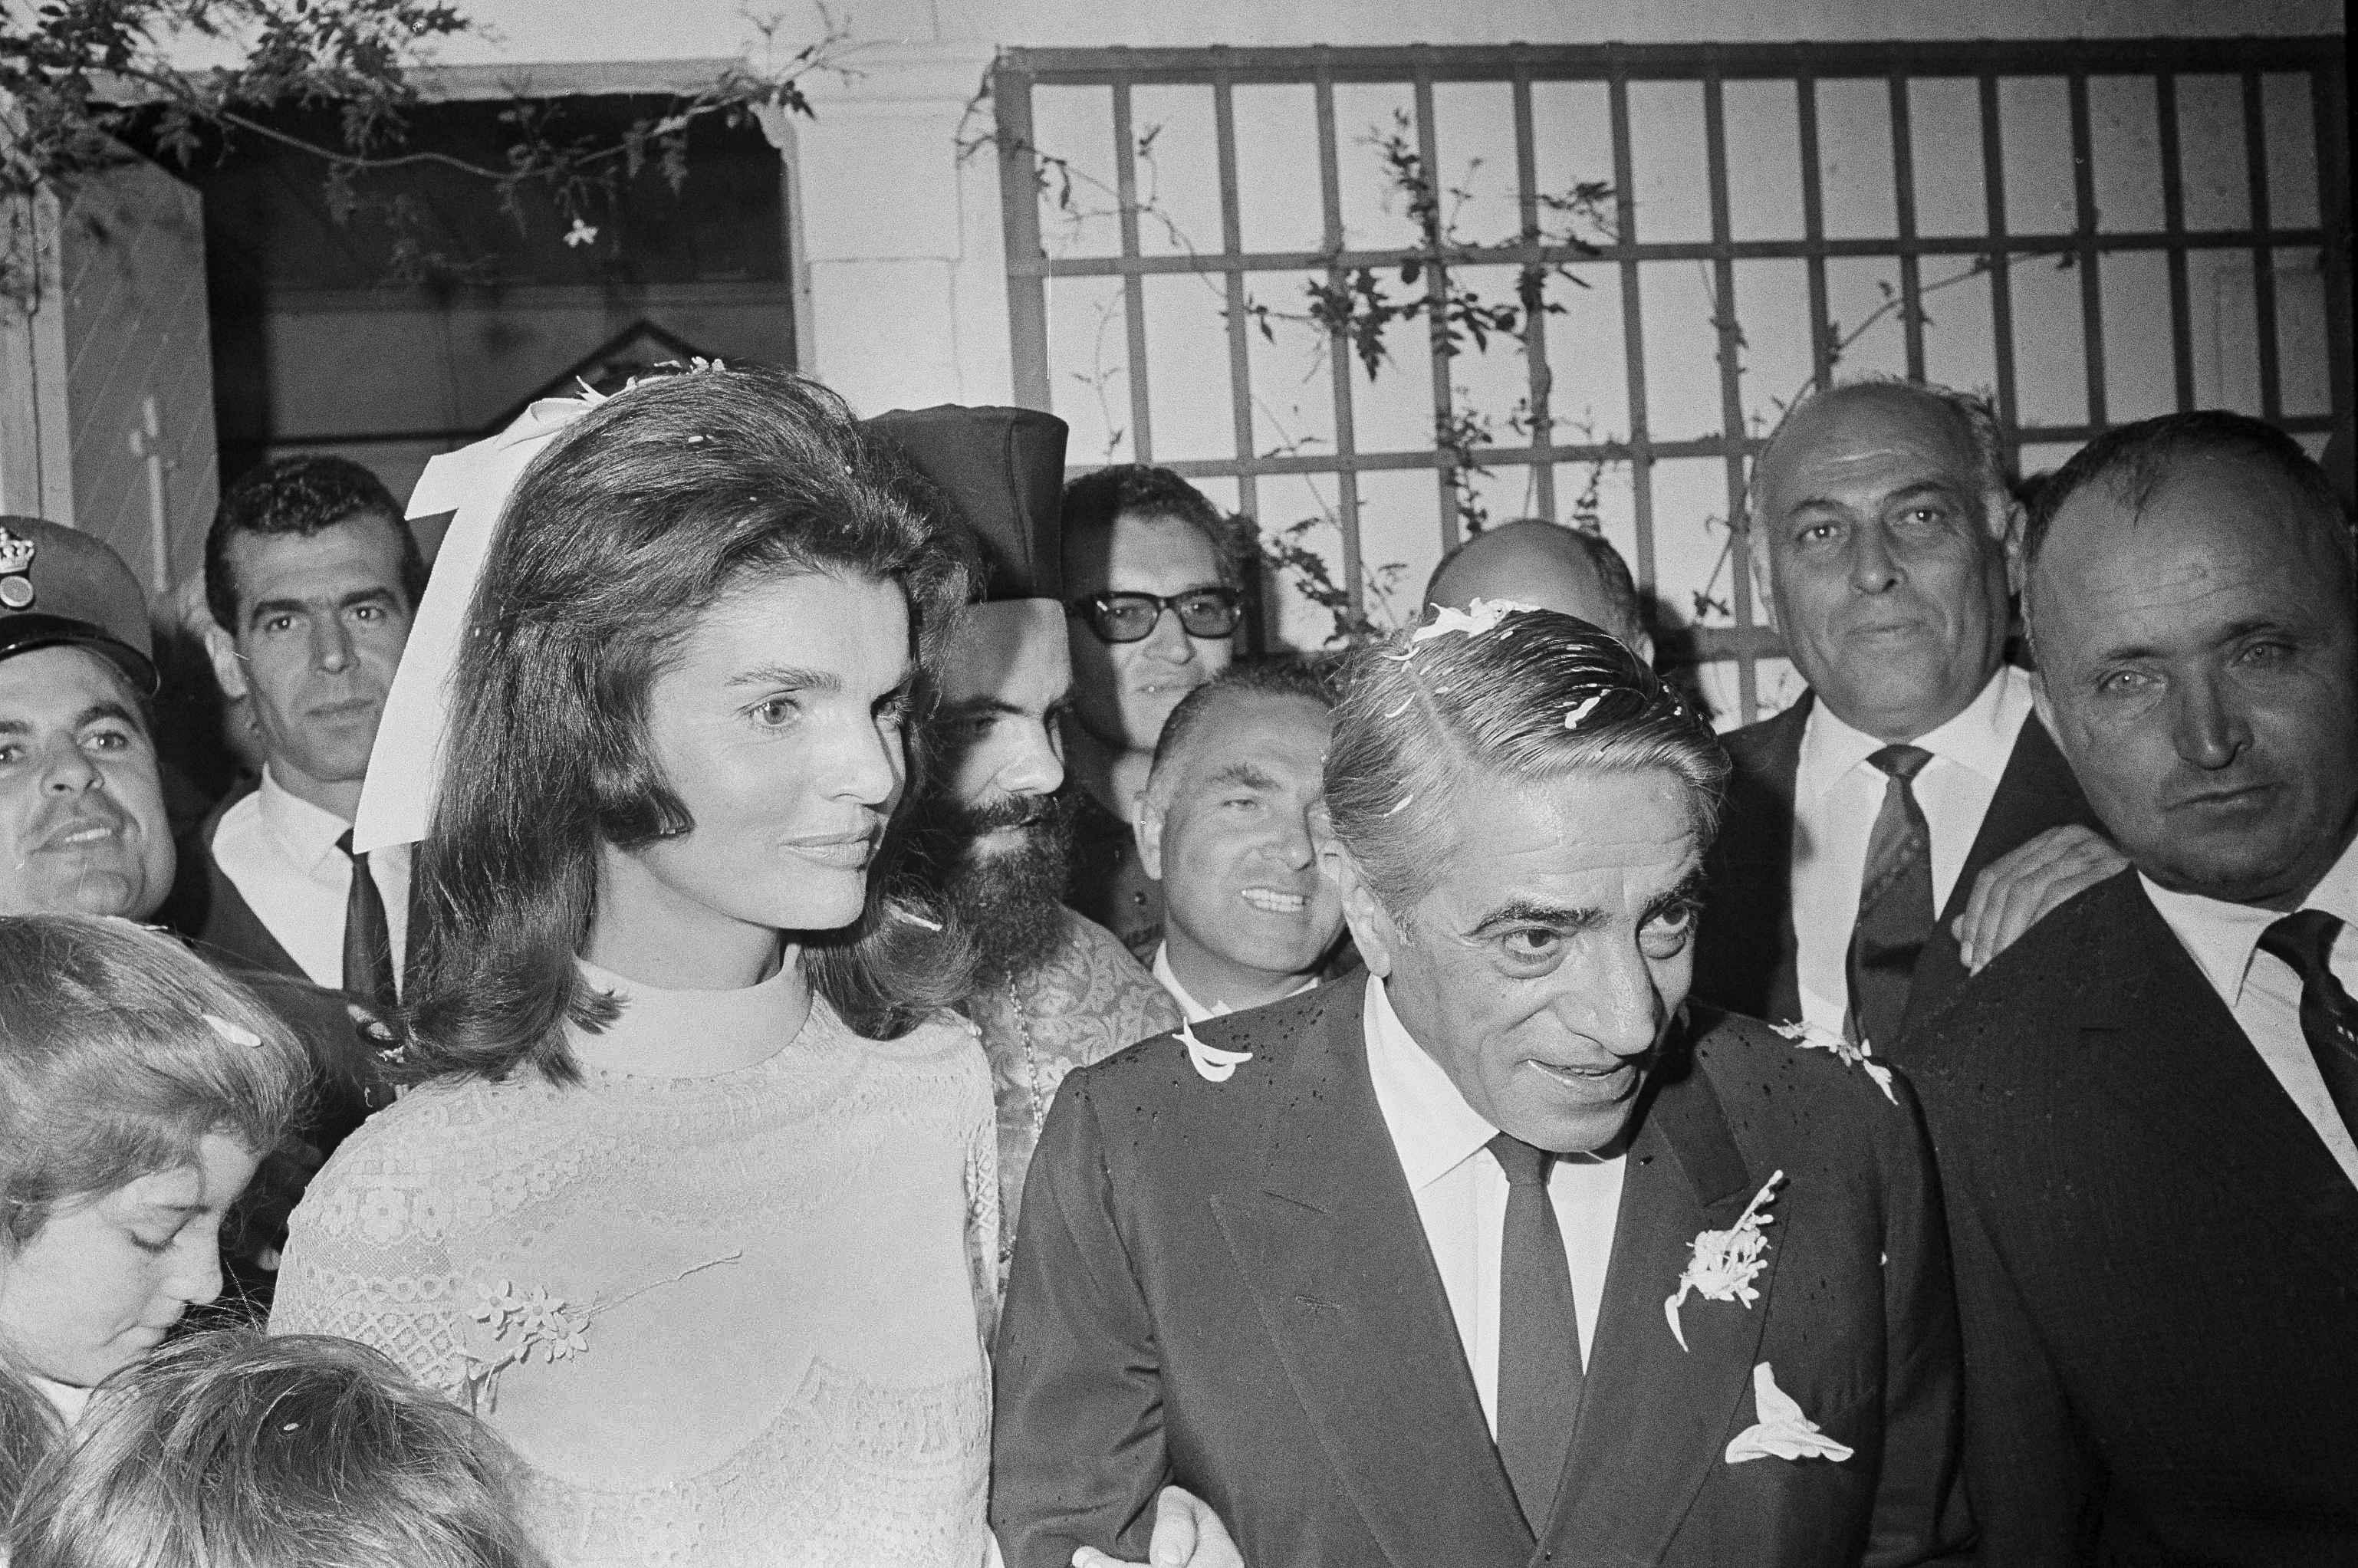 Jackie Kennedy: JFK's widow married Aristotle Onassis 50